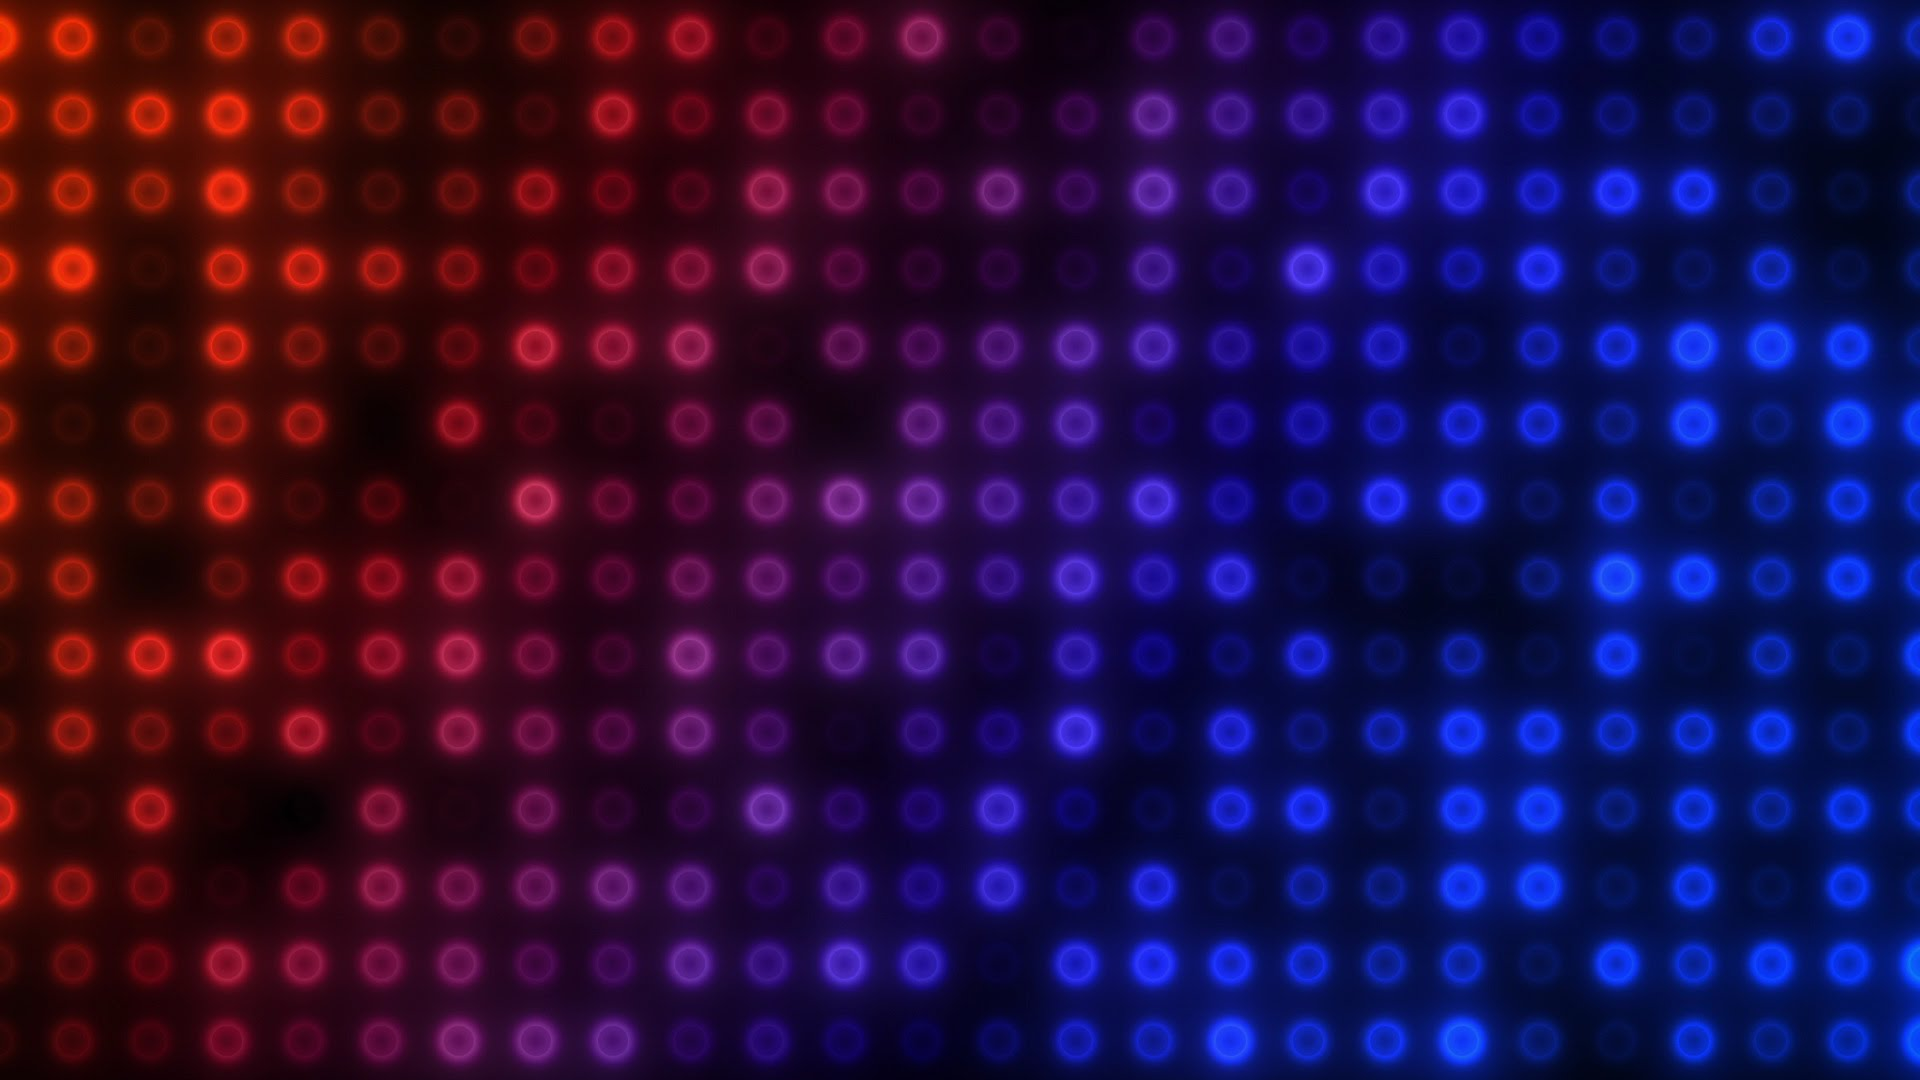 Wallpaper For Phones Fall Hd Digital Backgrounds Hd Wallpapers Pulse